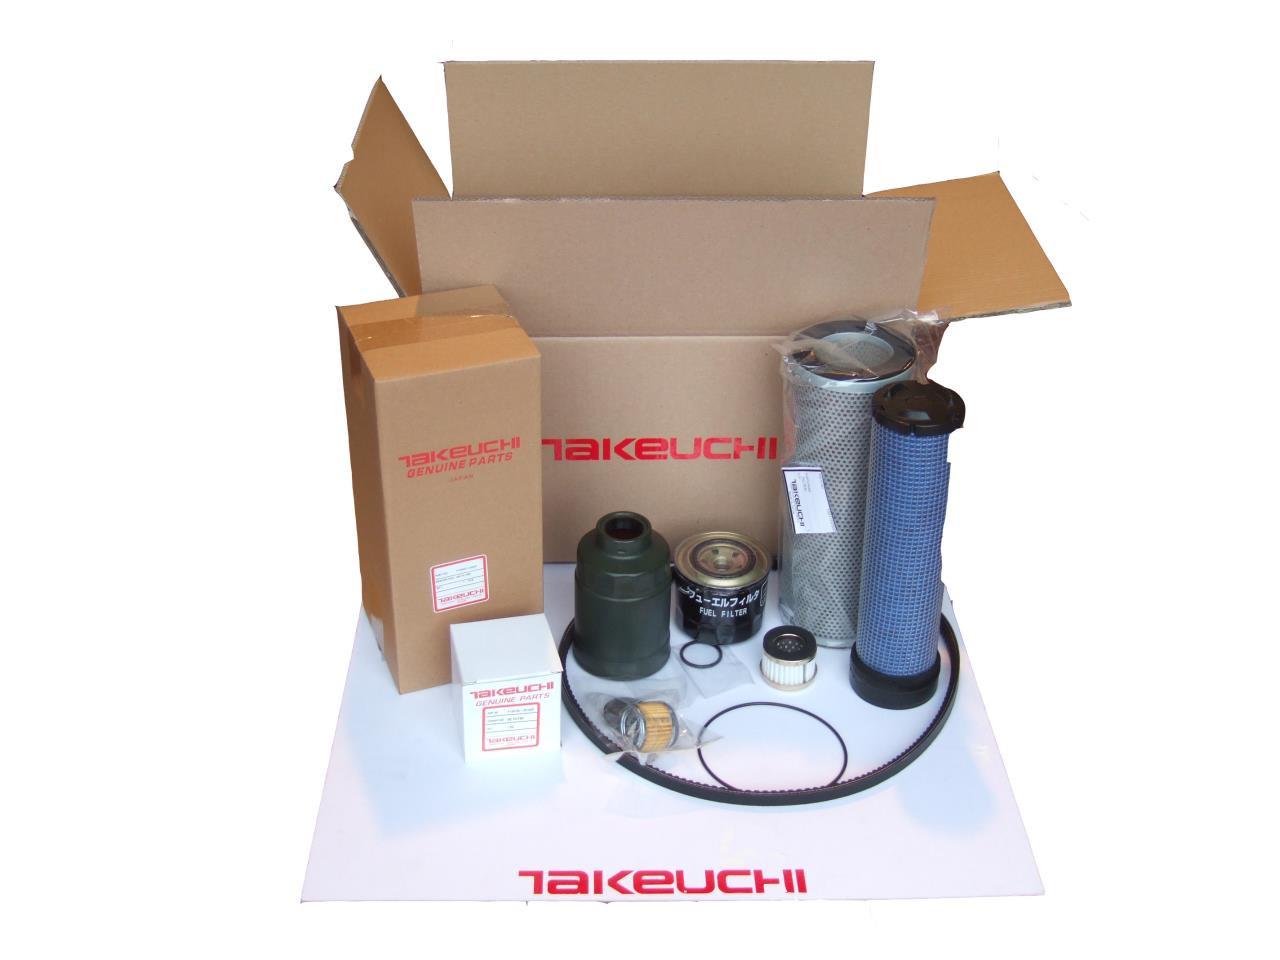 Takeuchi TB216 filtersæt